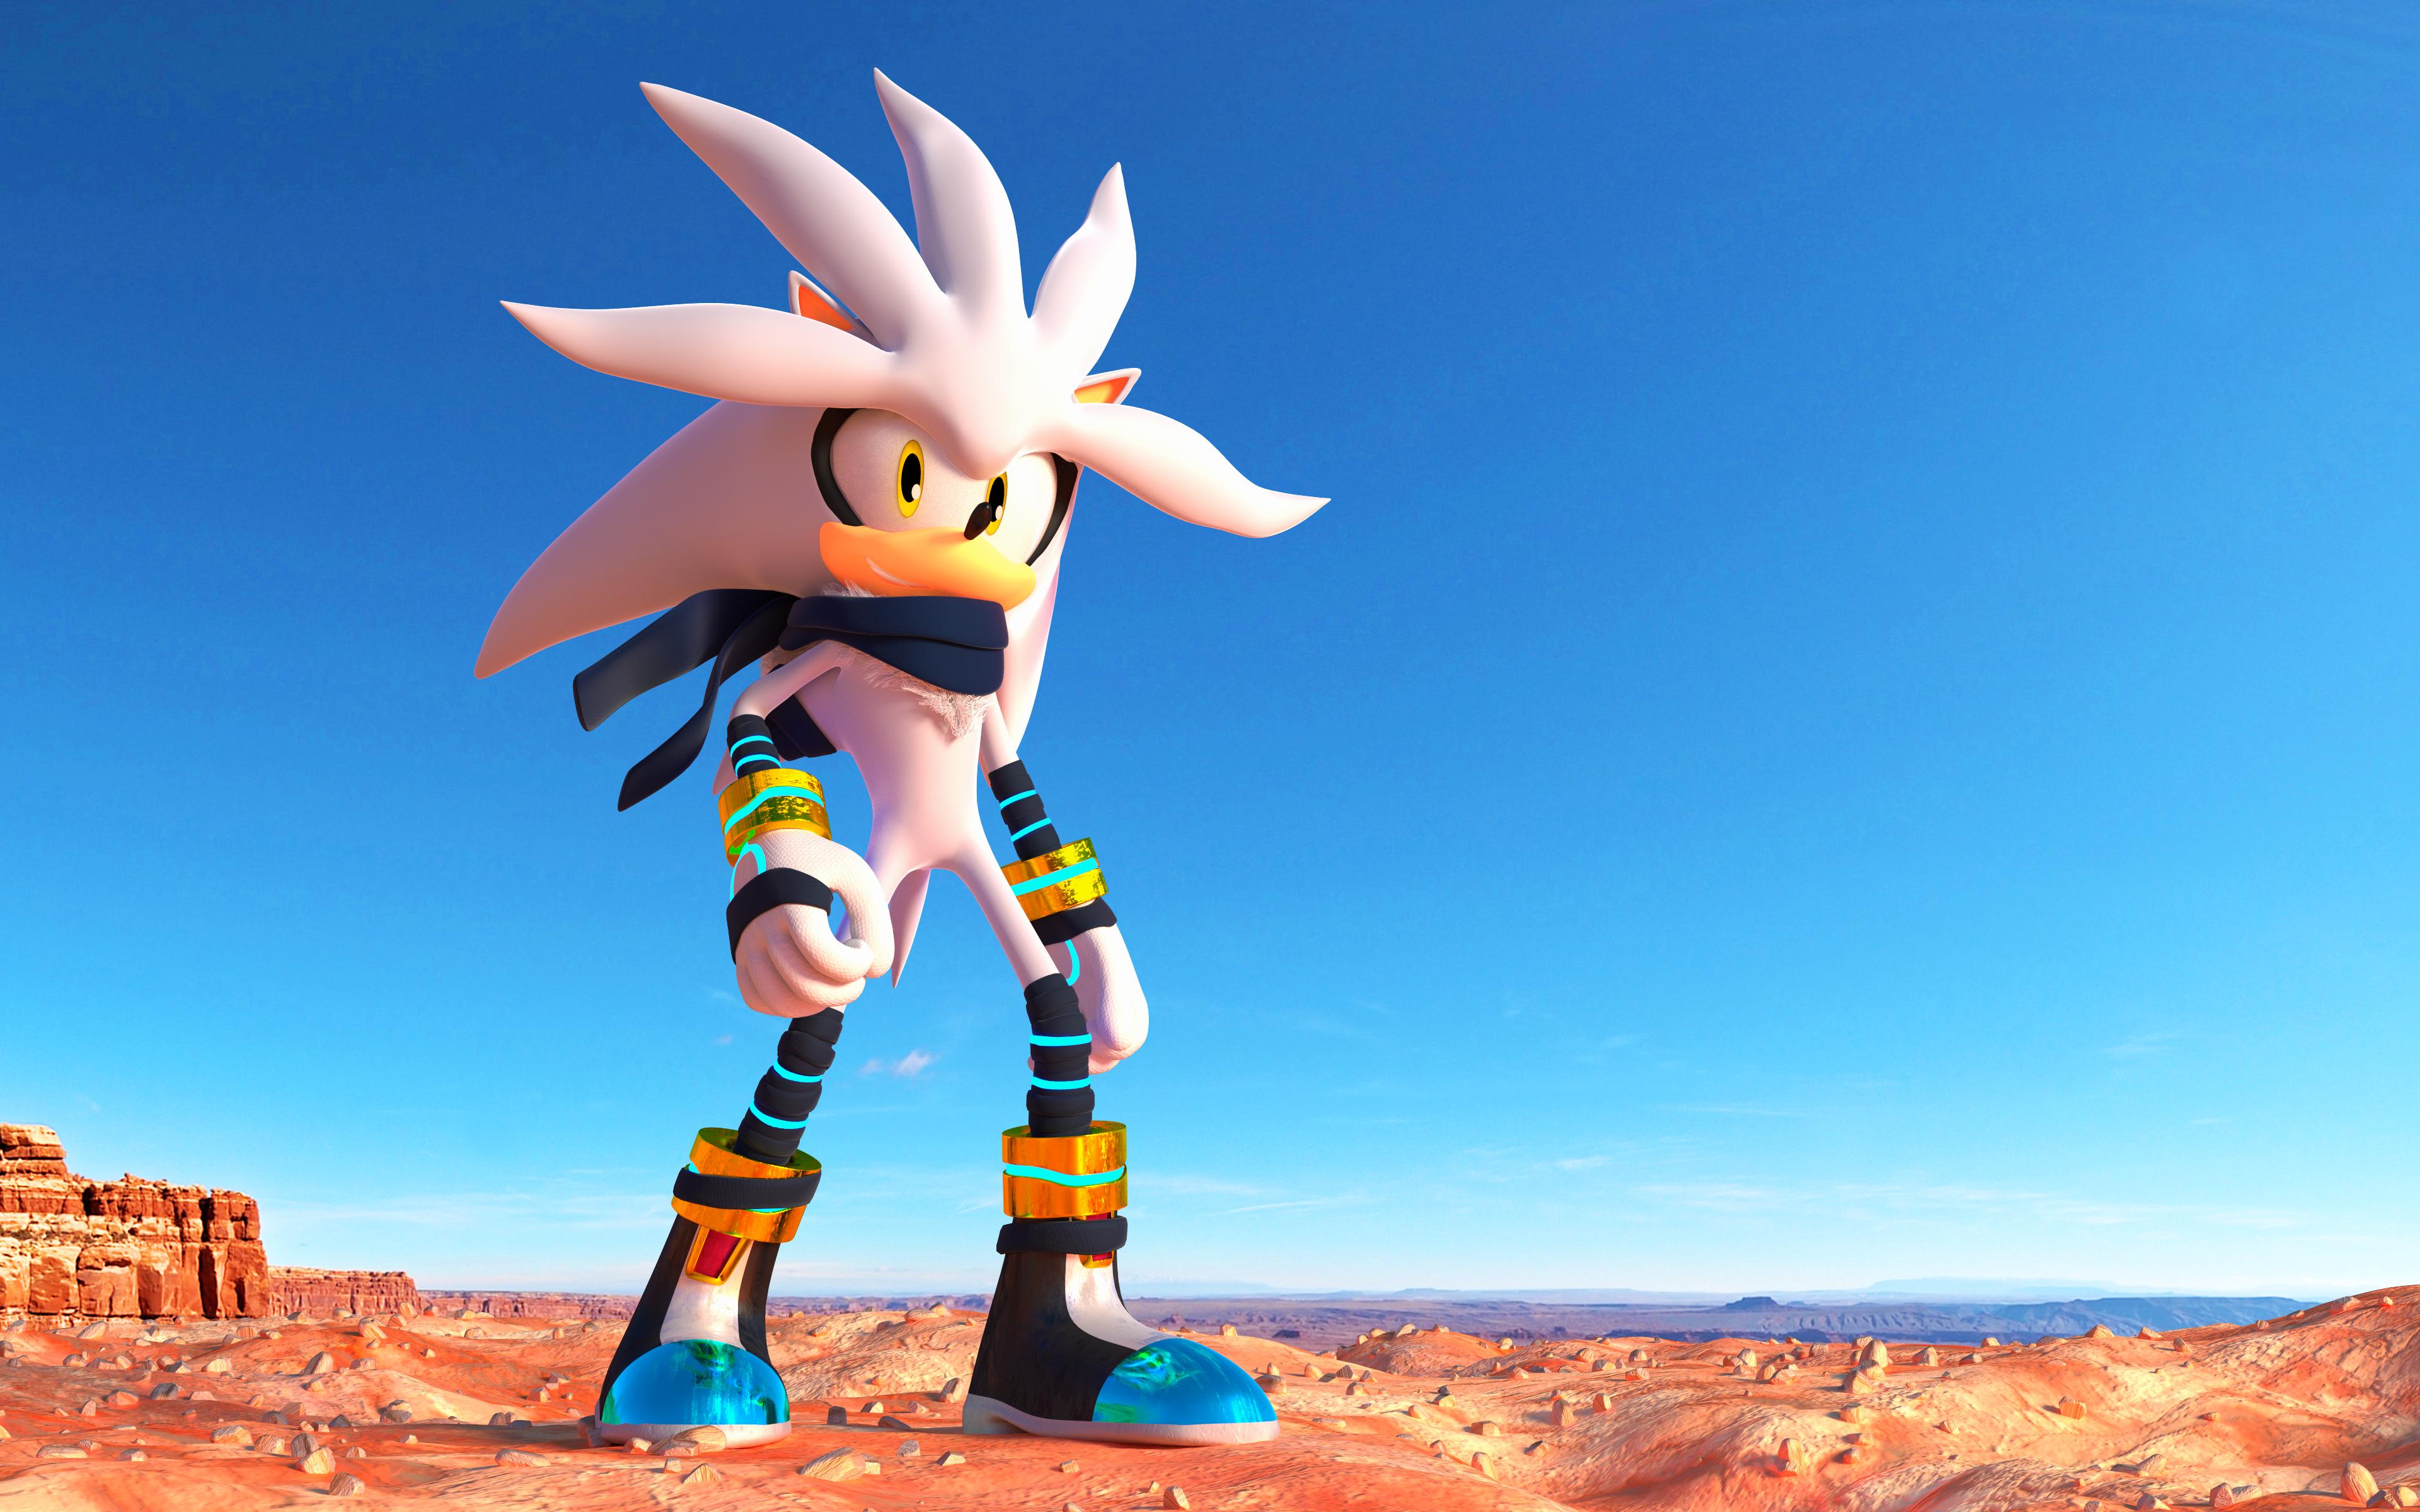 Silver Boom By K7g5 Deviantart Com On Deviantart Sonic Fan Characters Sonic Boom Sonic The Hedgehog